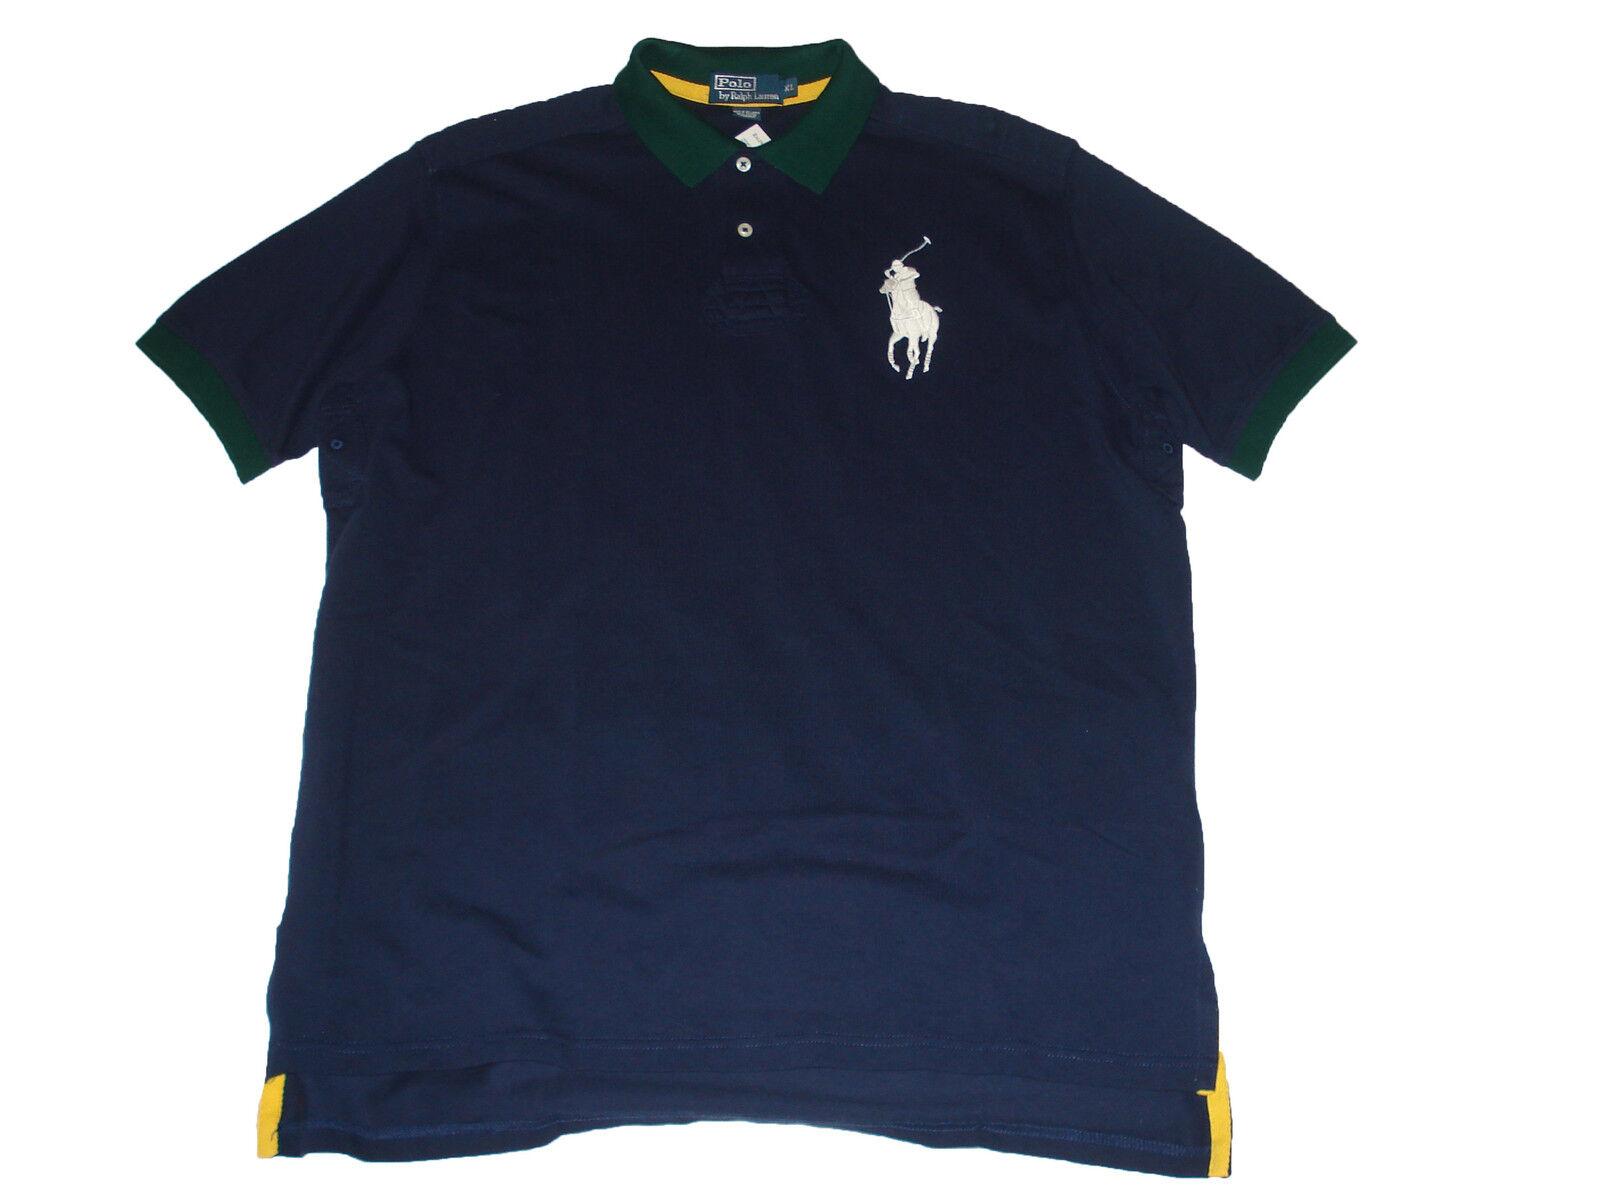 Polo Ralph Lauren Big Pony XL Navy bluee Rugby Jersey Shirt